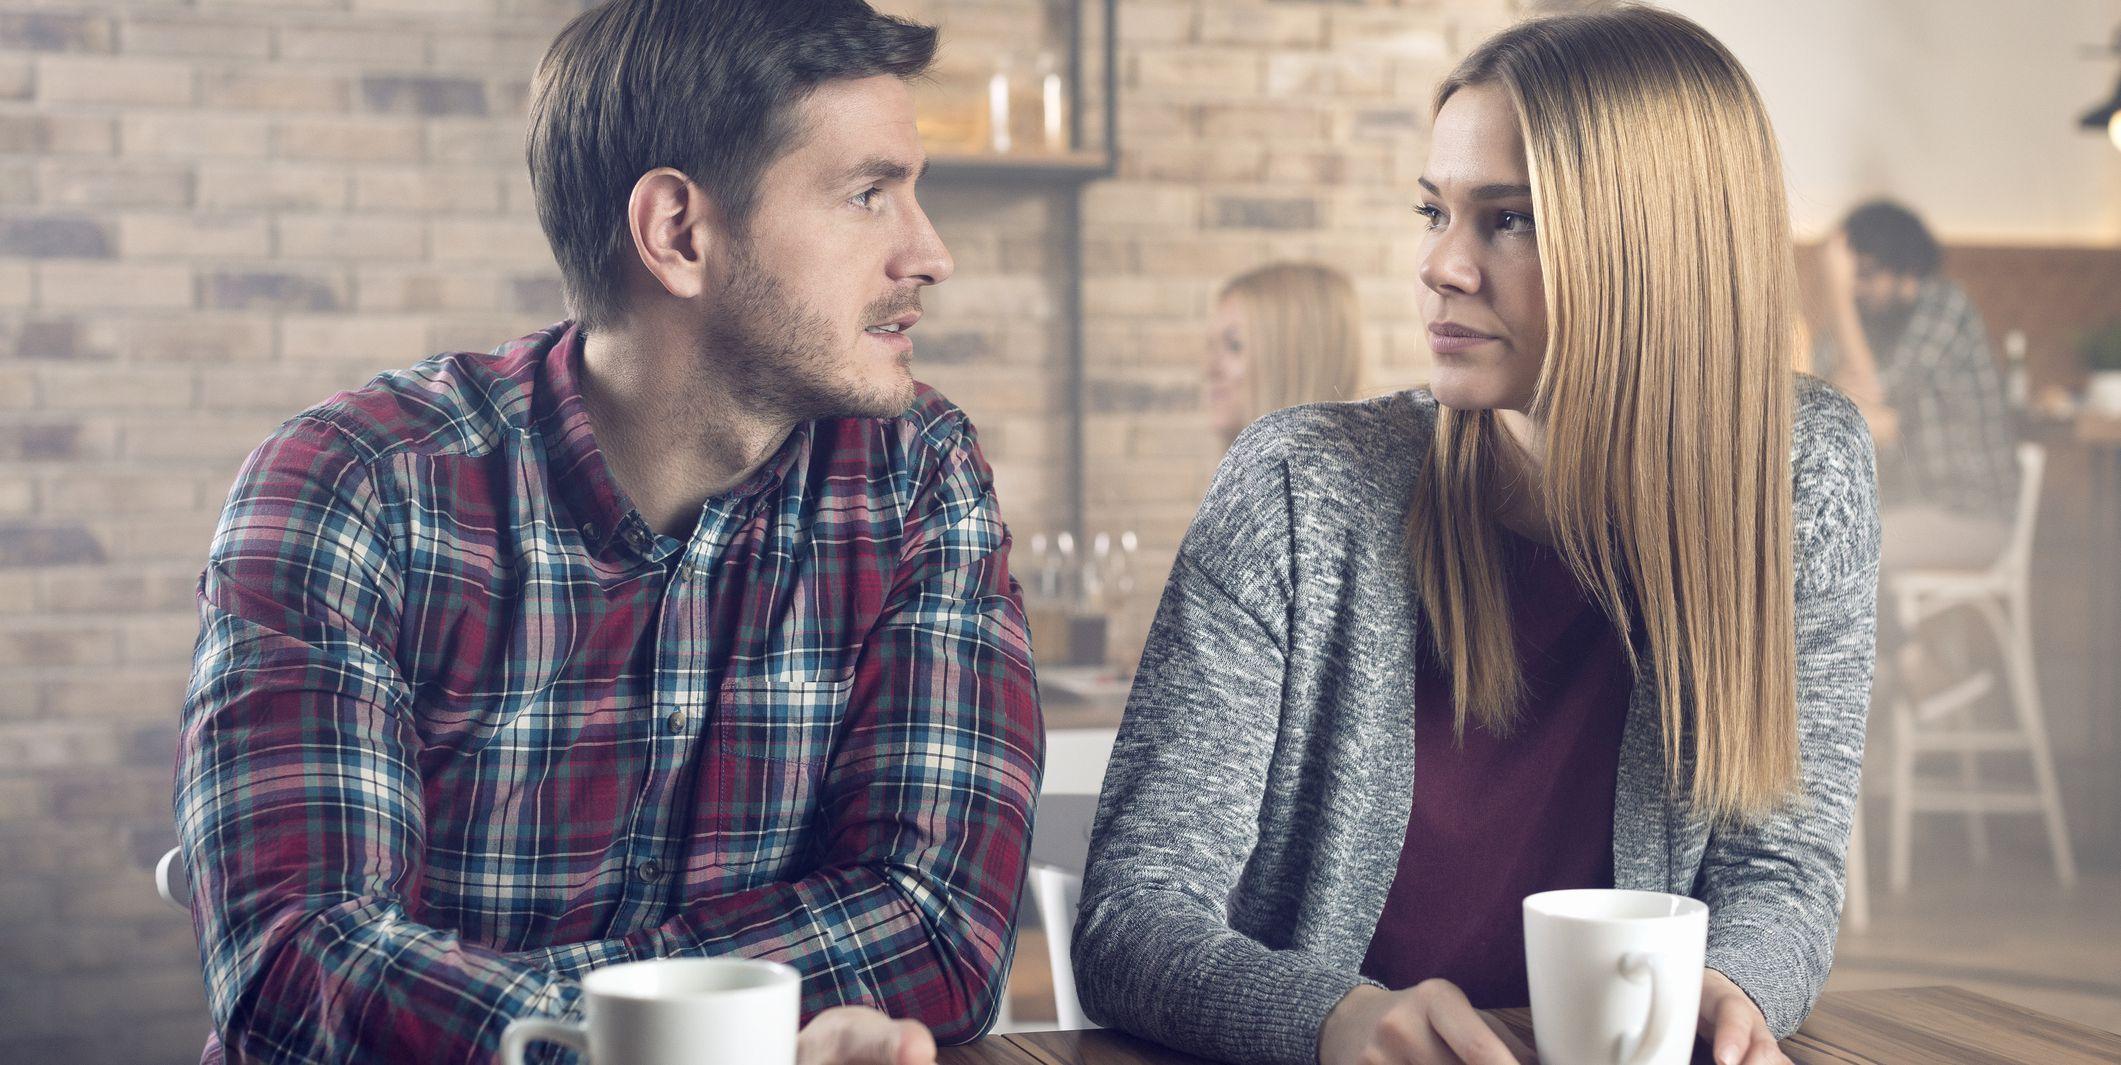 dating difficult for guys reddit